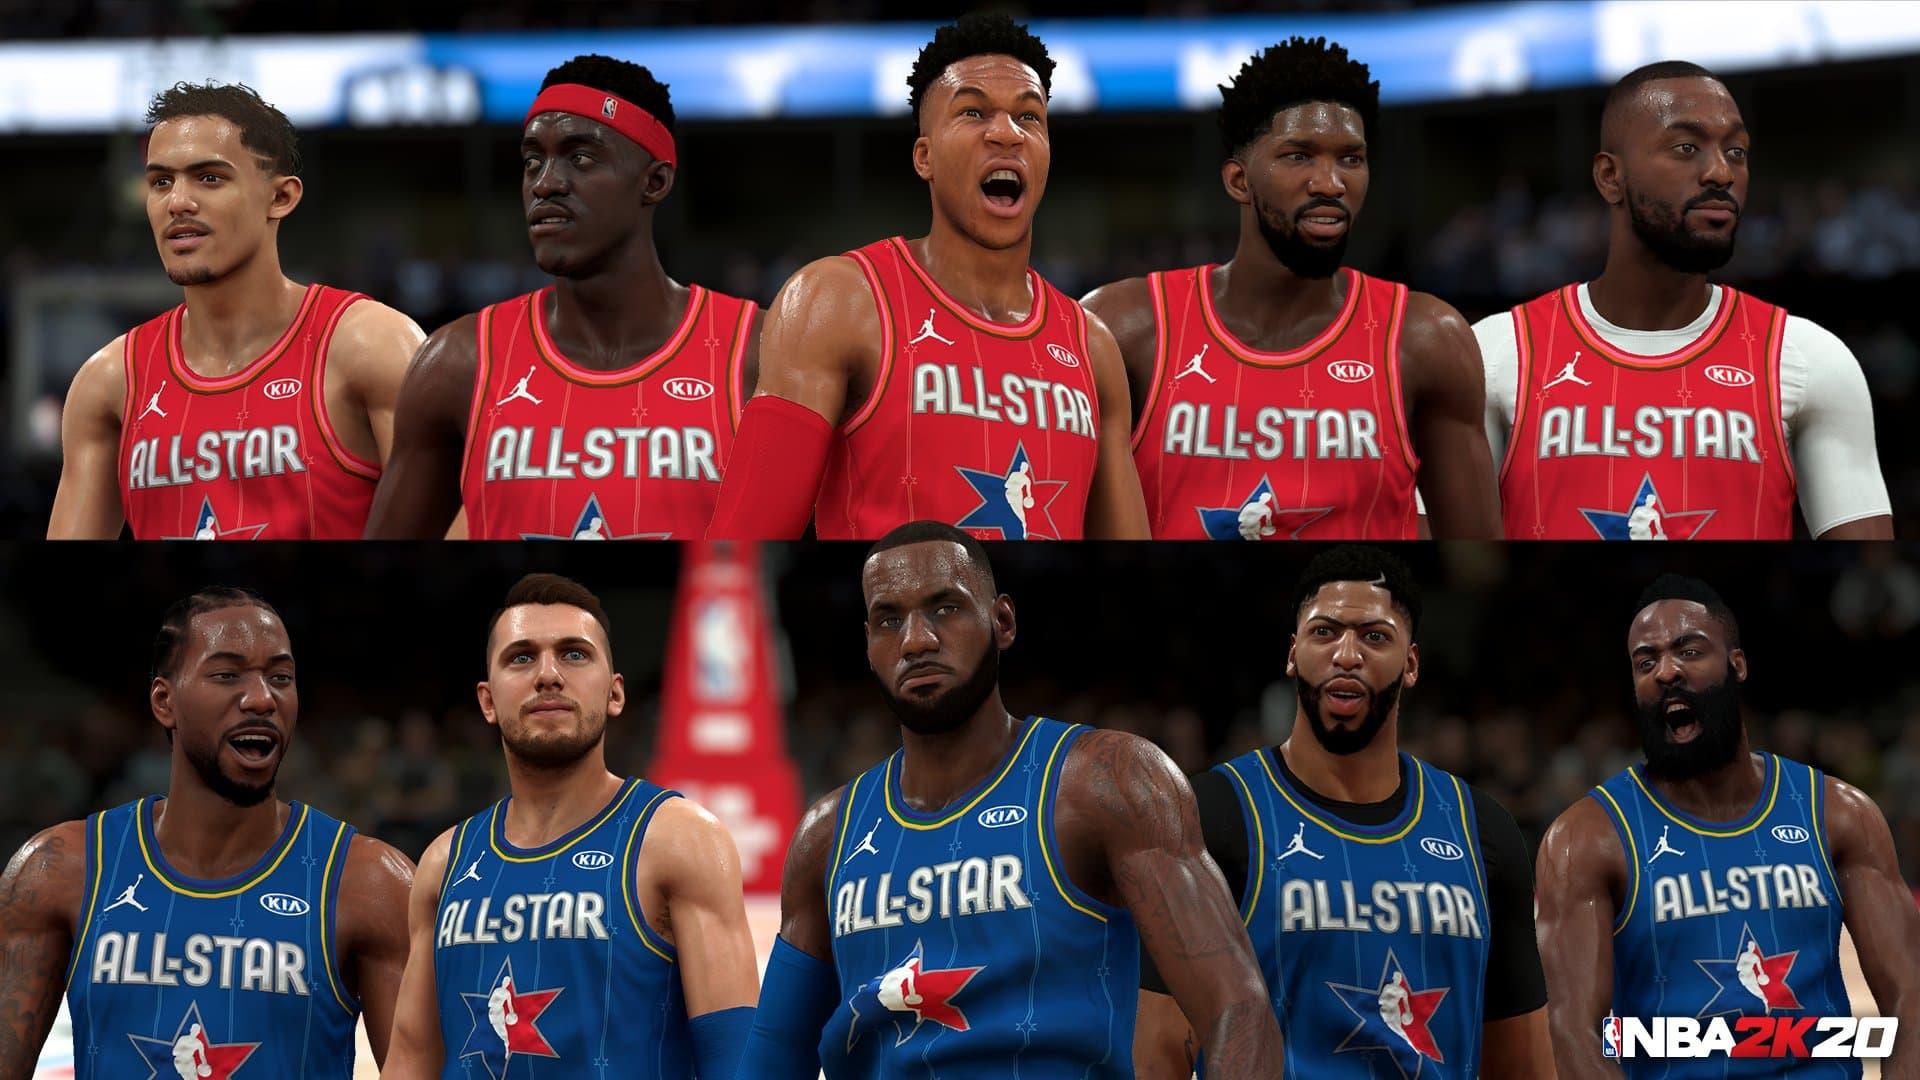 Juega gratis al NBA All-Star Weekend 2020 en NBA 2K20 10